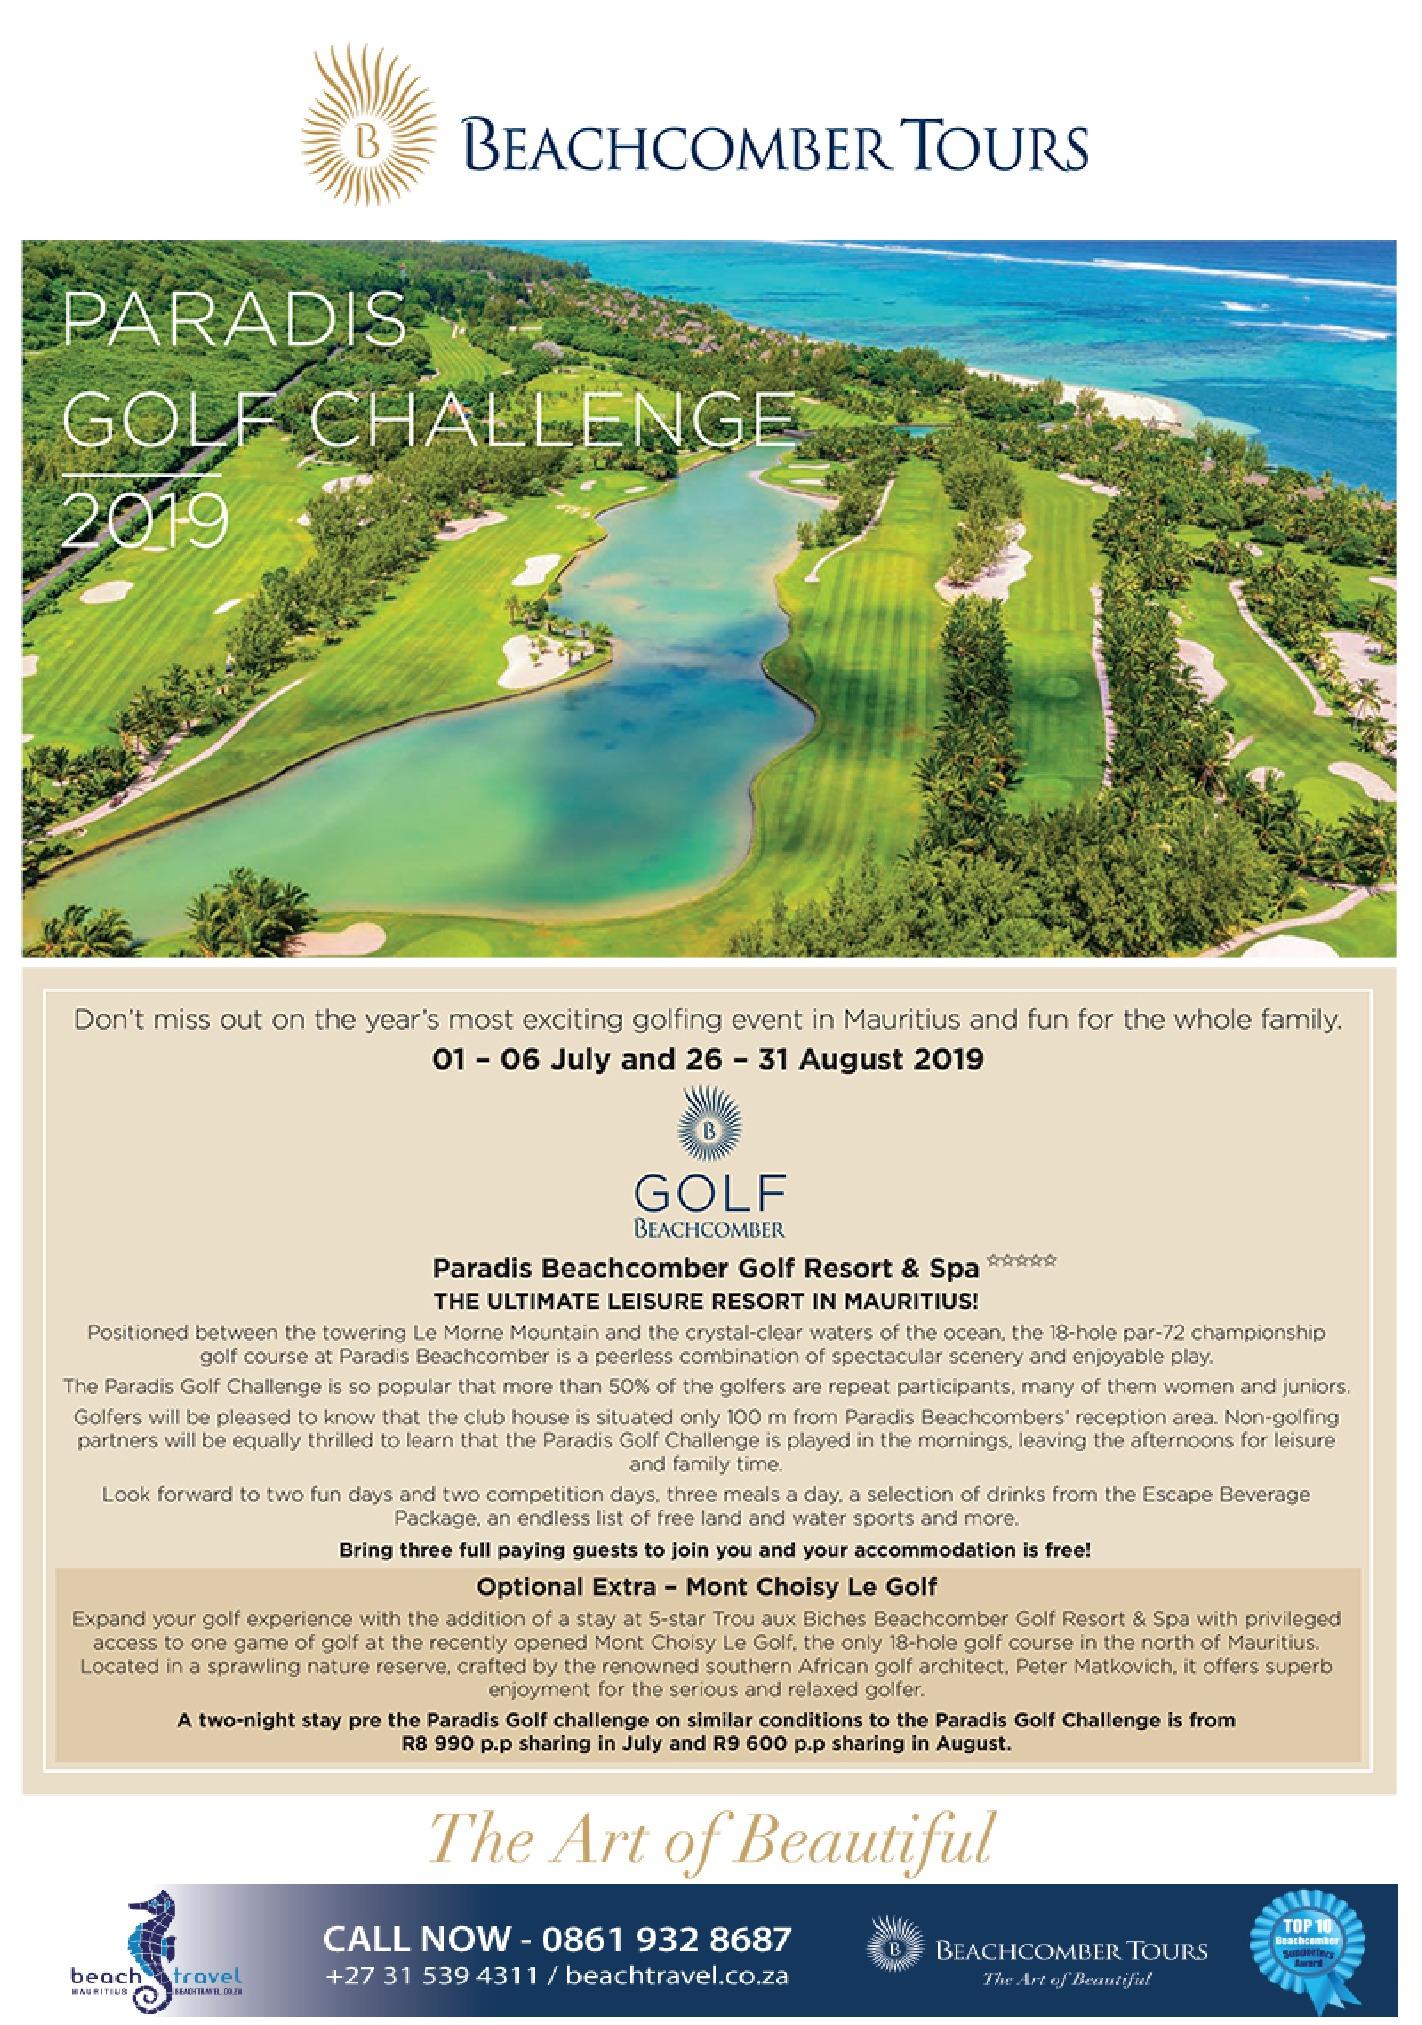 Beachcomber – Paradis Golf Challenge 2019